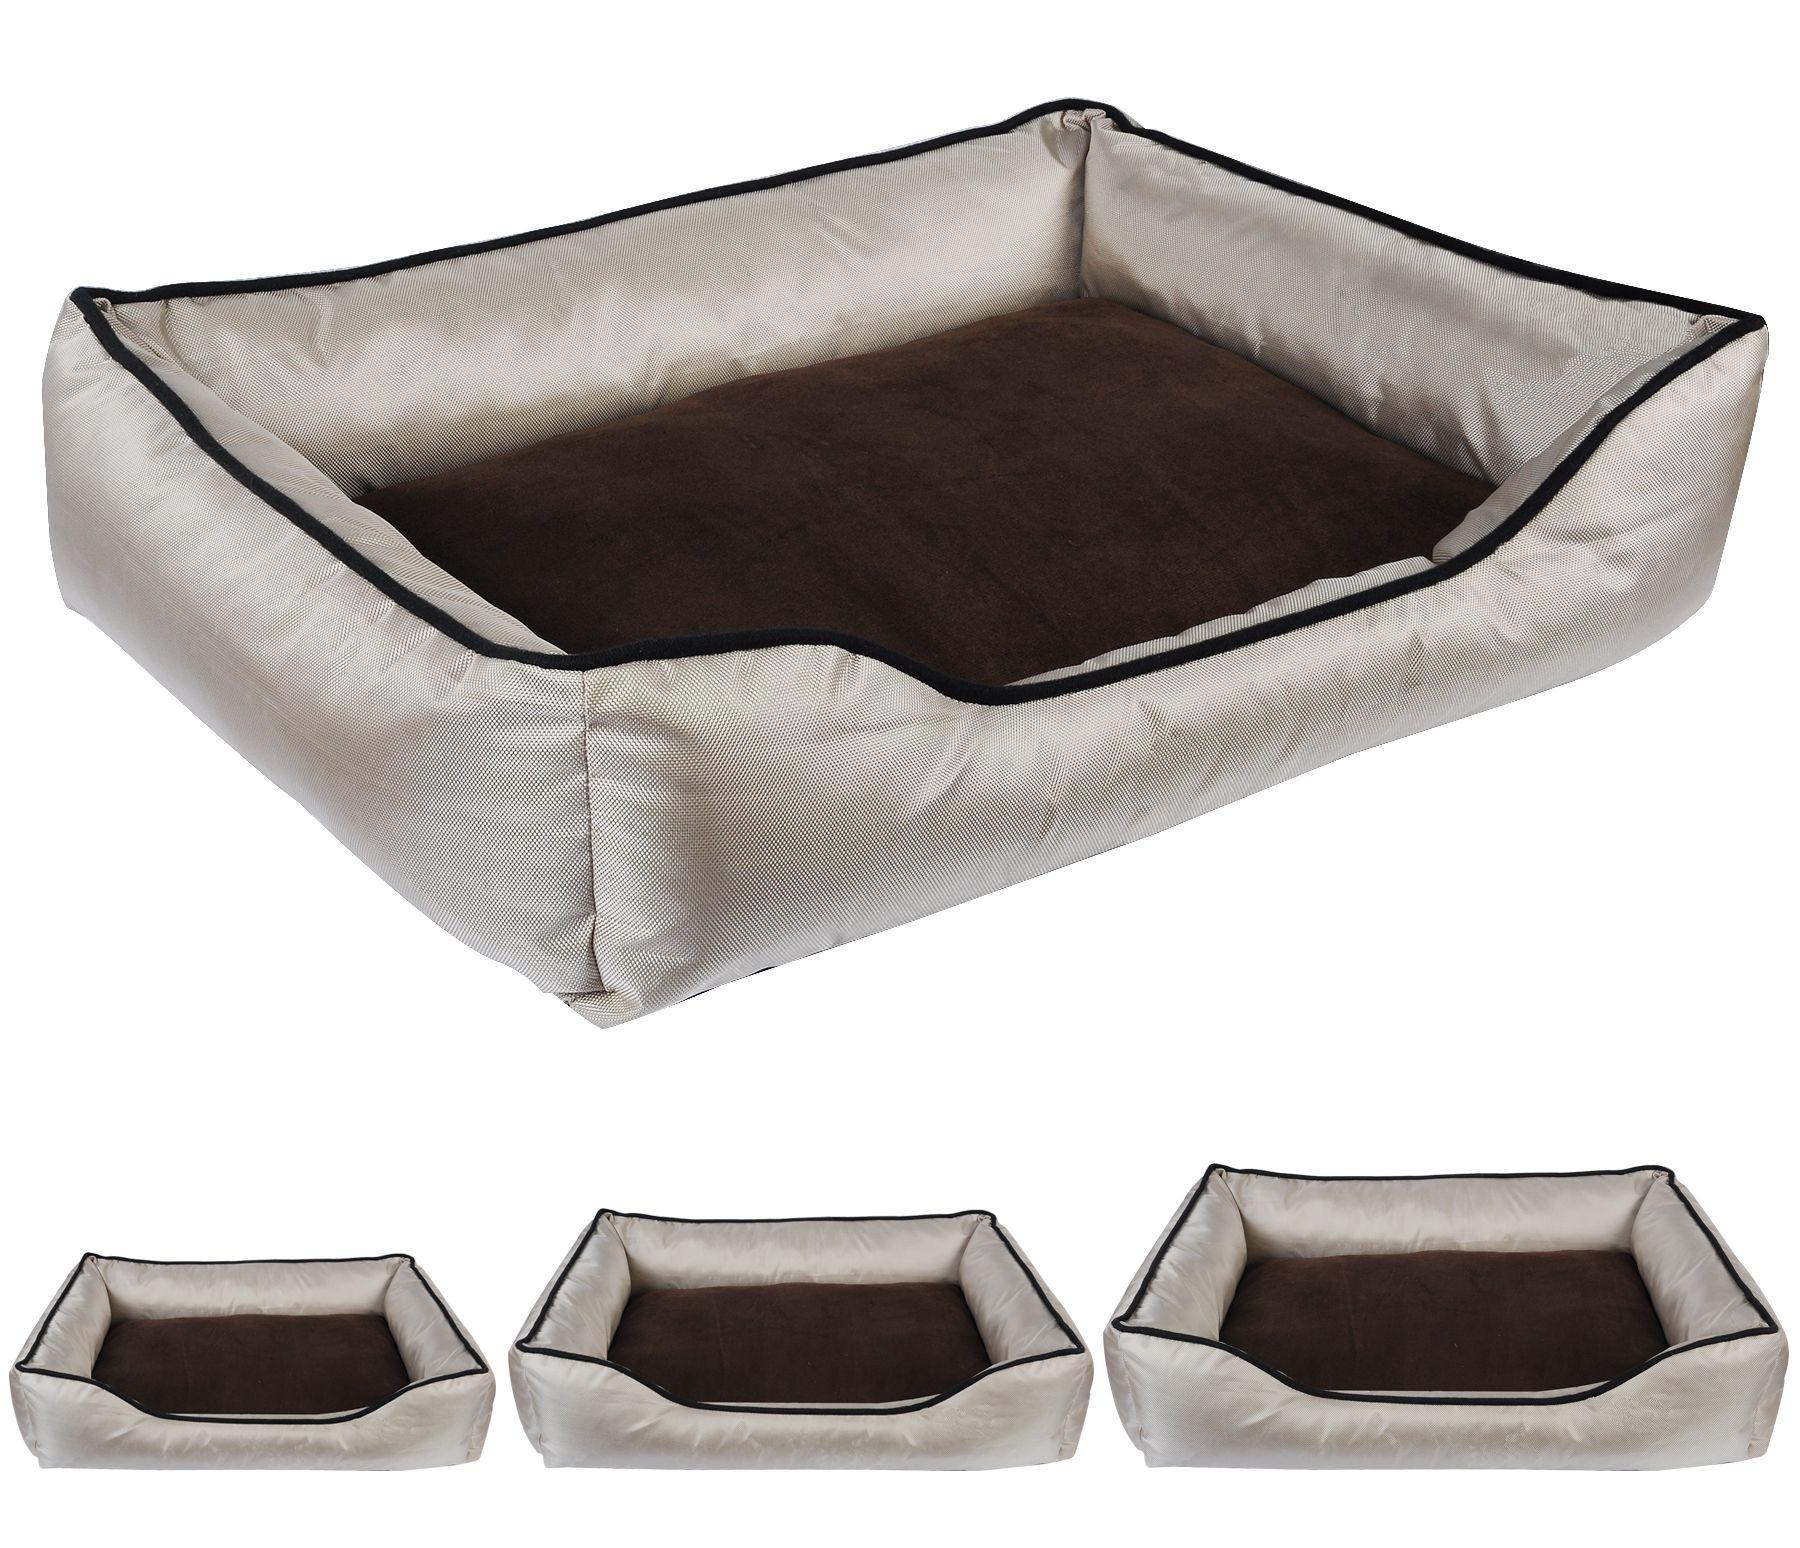 Hundekissen Hundekorb aus weicher Polyesterwatte Tierbett Hunde Bett ...